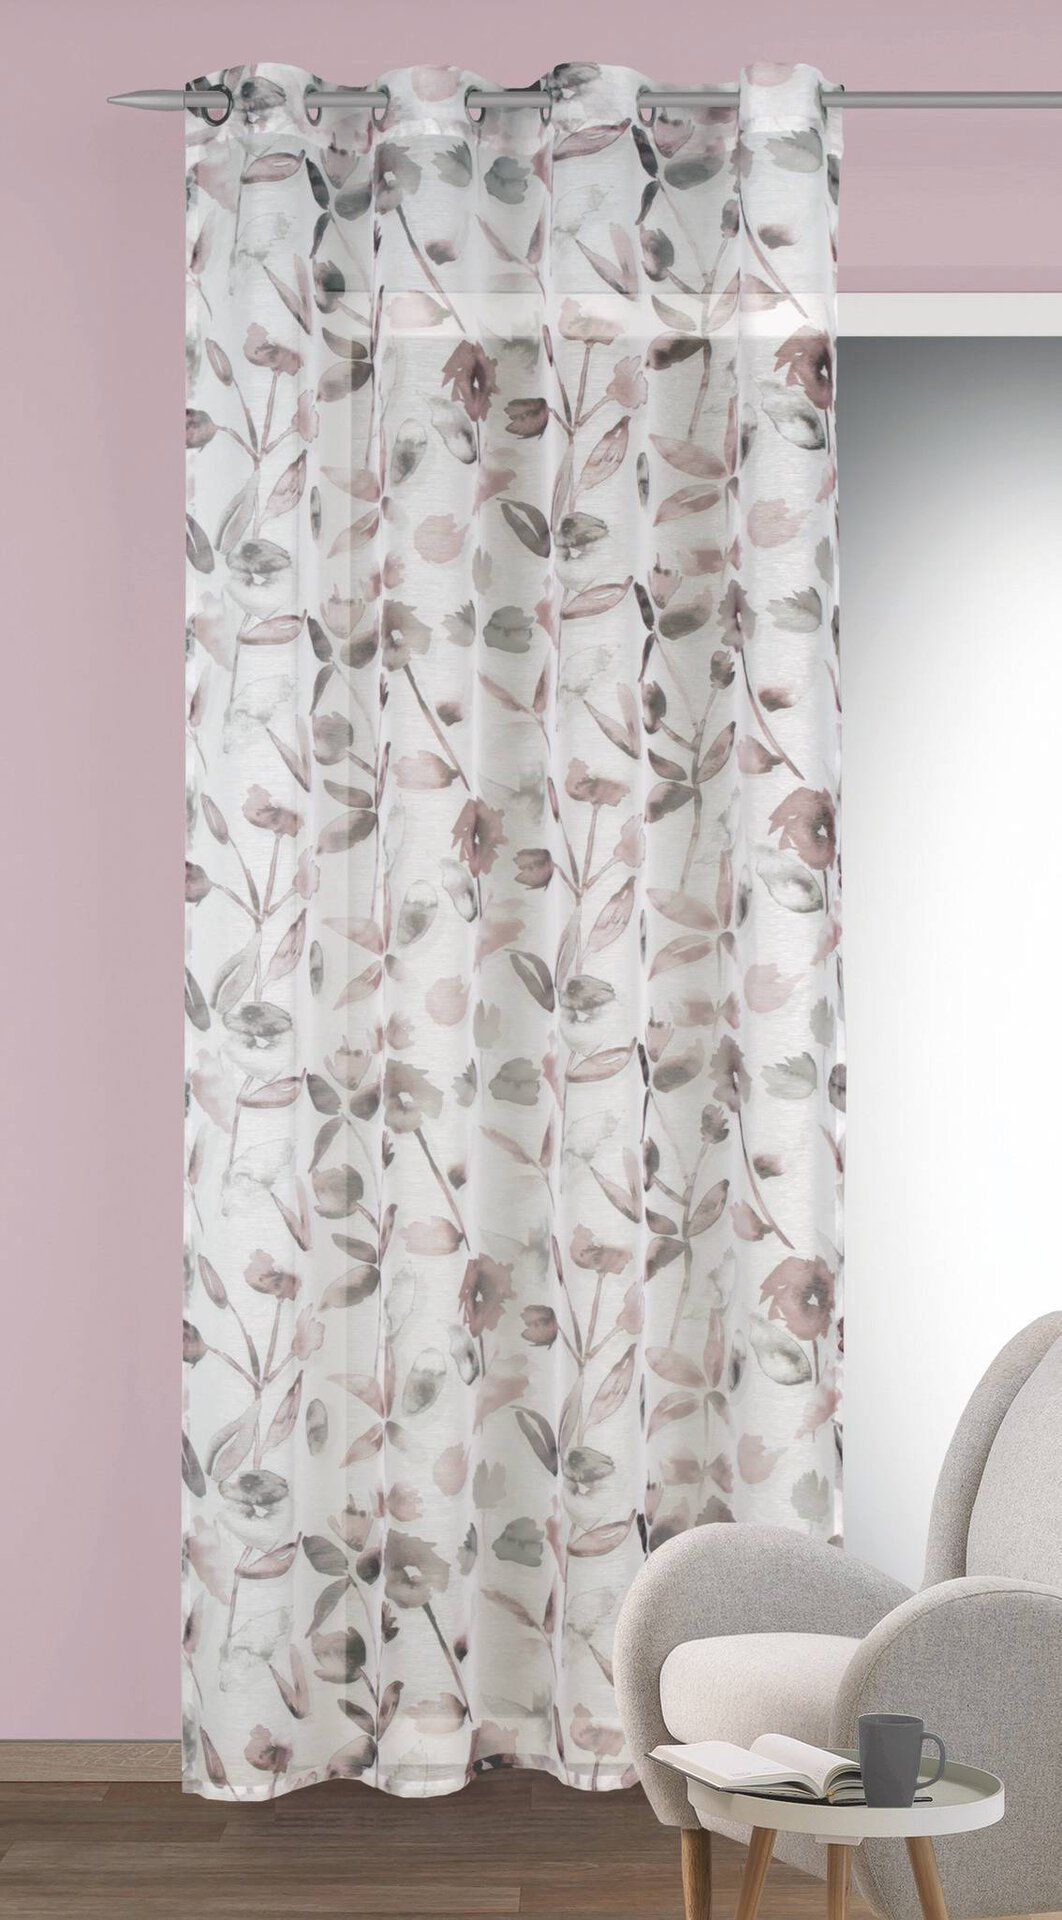 Ösenschal Asra Albani Textil weiß 135 x 245 cm